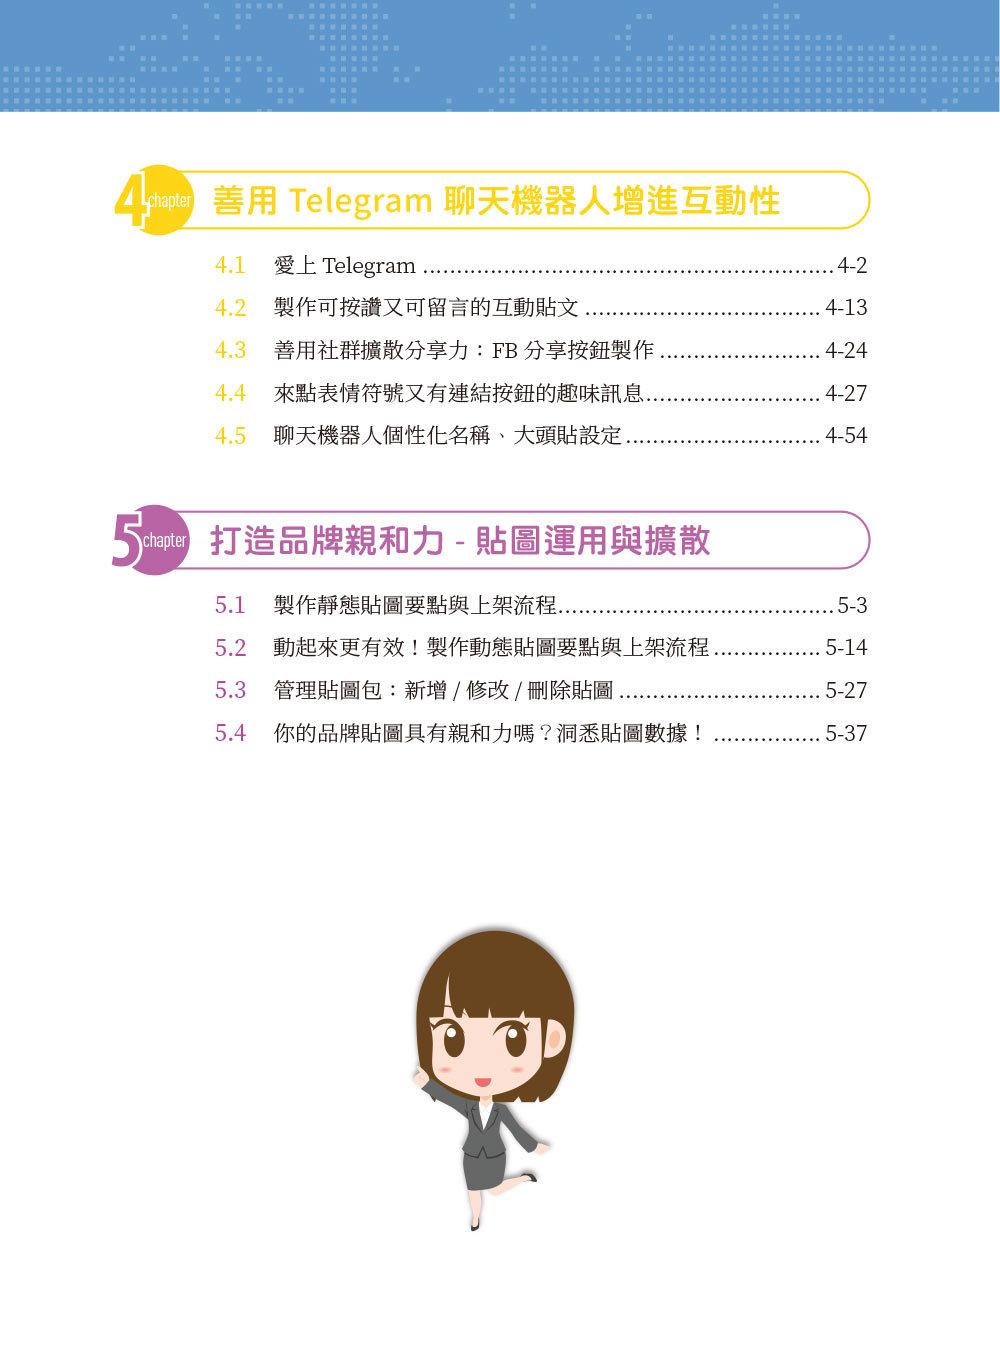 Telegram 行動行銷|操作技巧x品牌貼圖x經營心法-preview-2